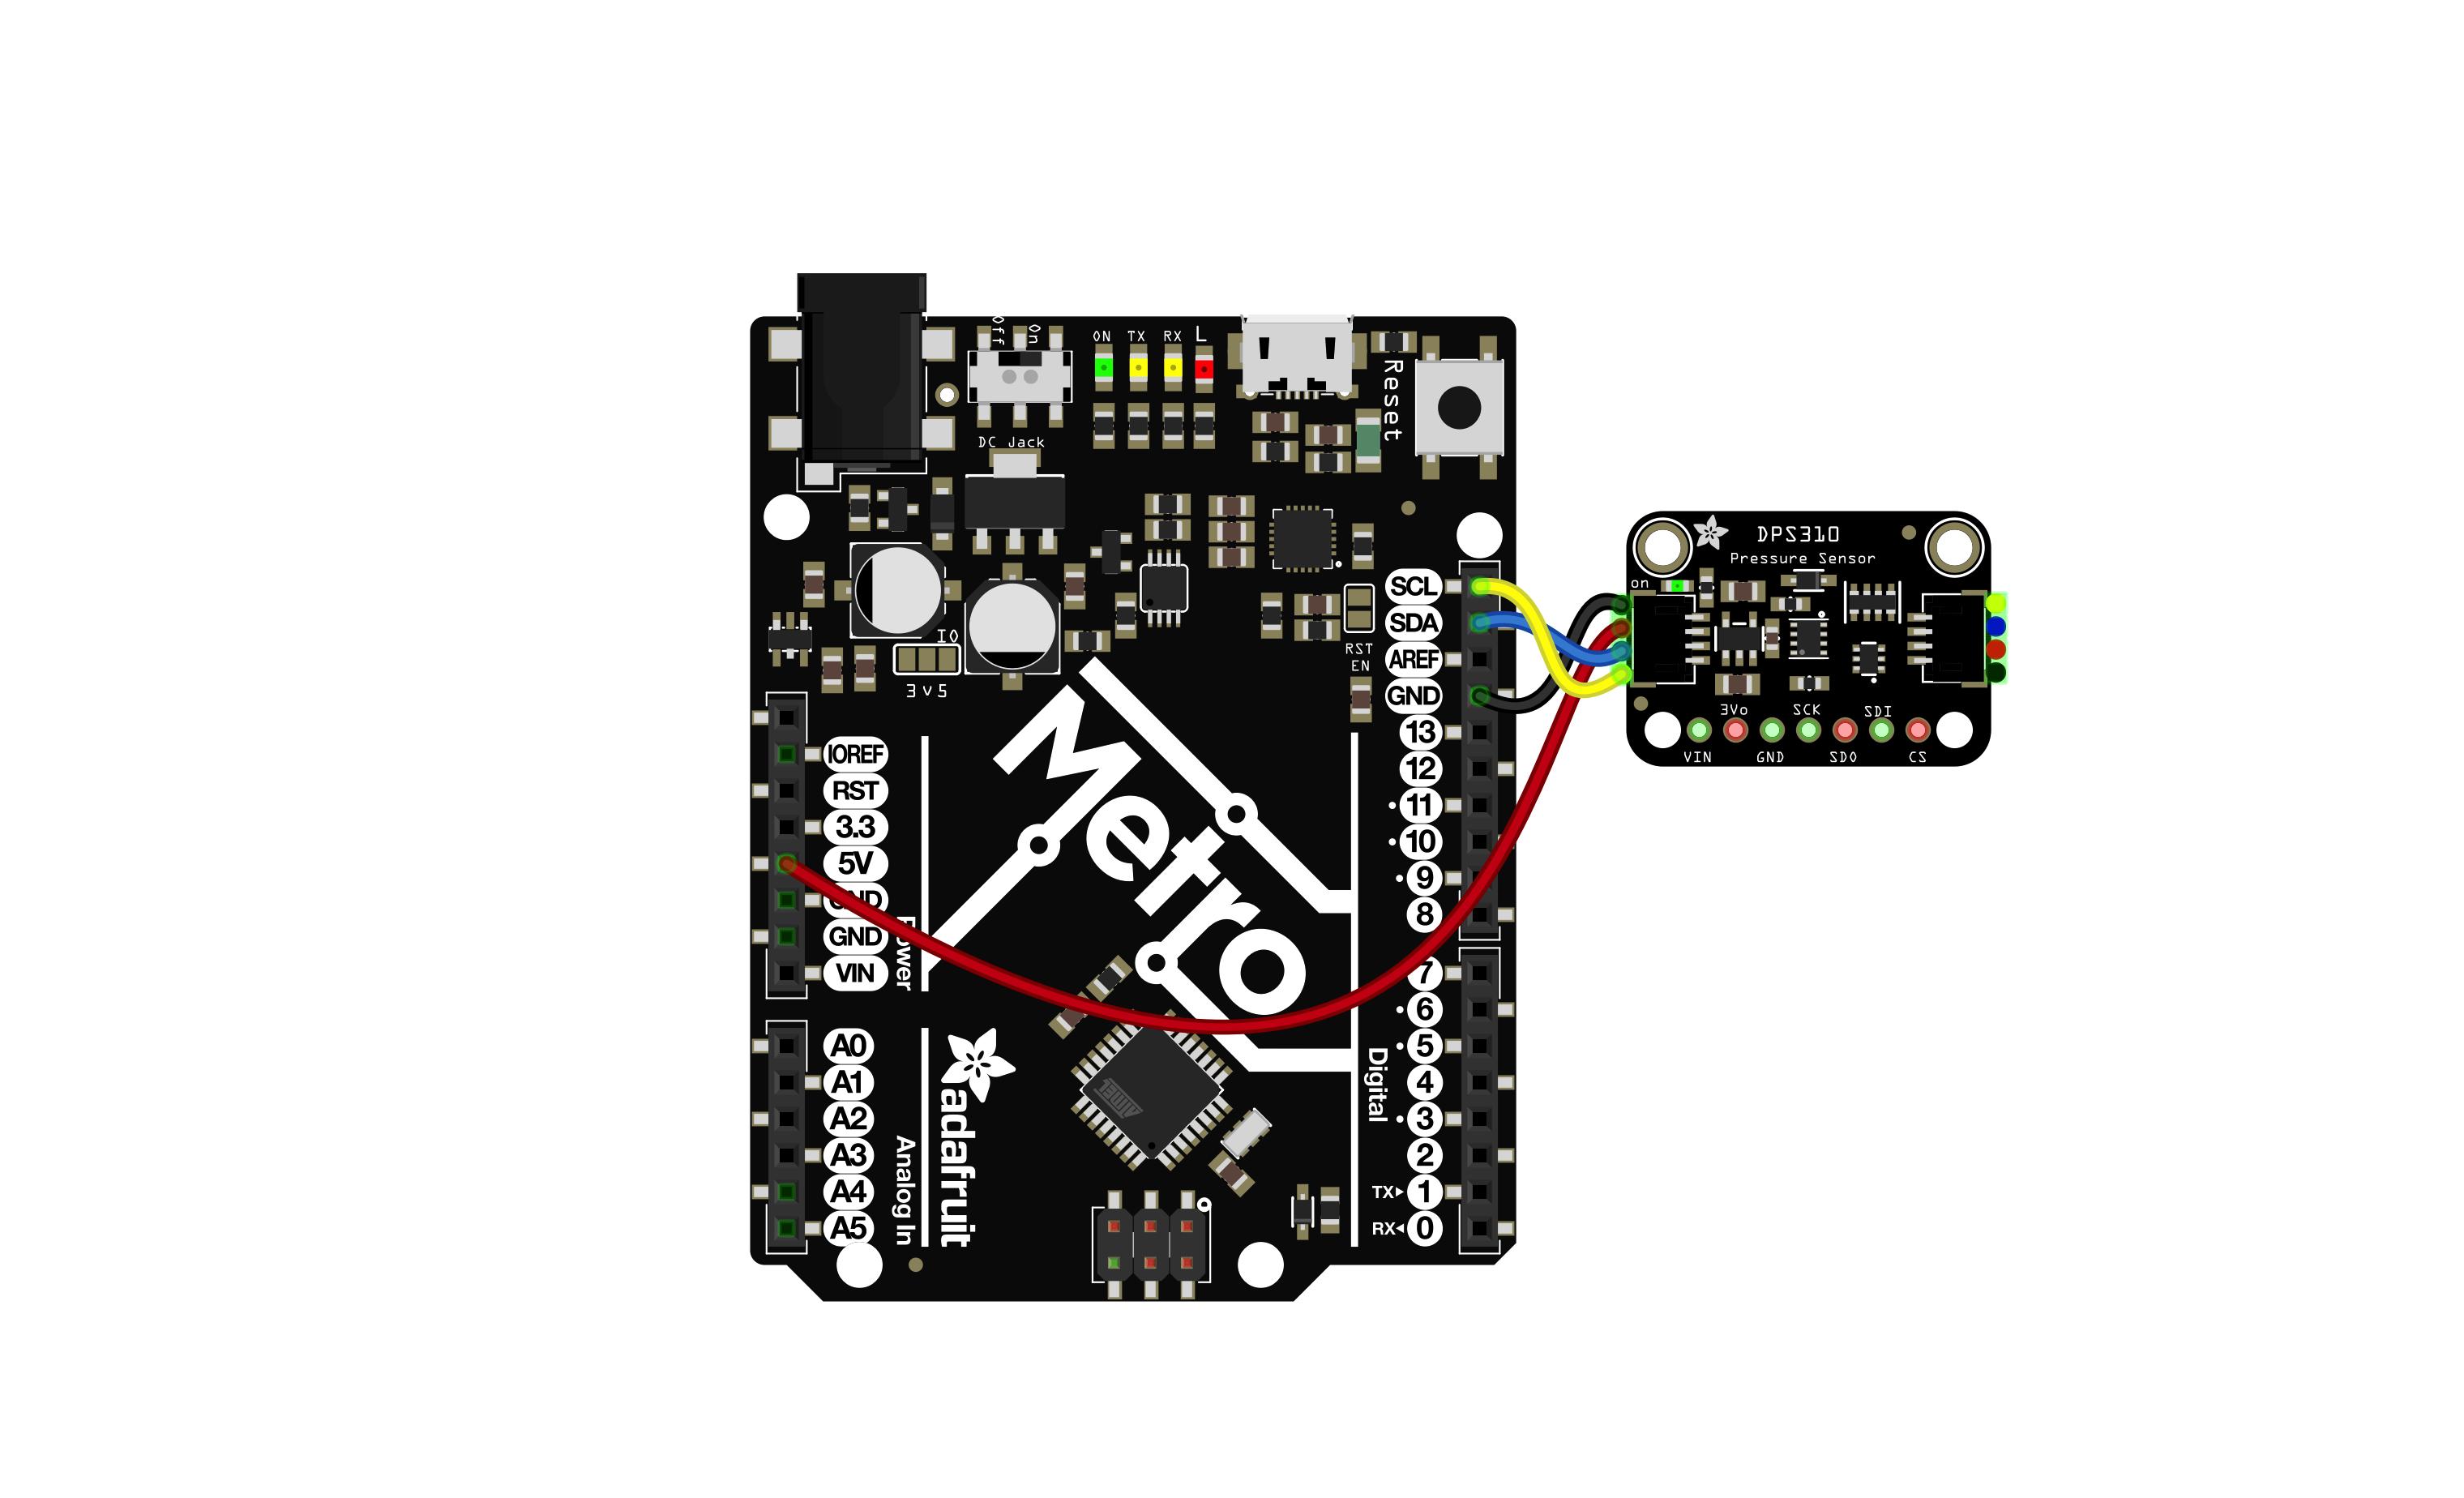 sensors_w_arduino_wiring_a_QT.png